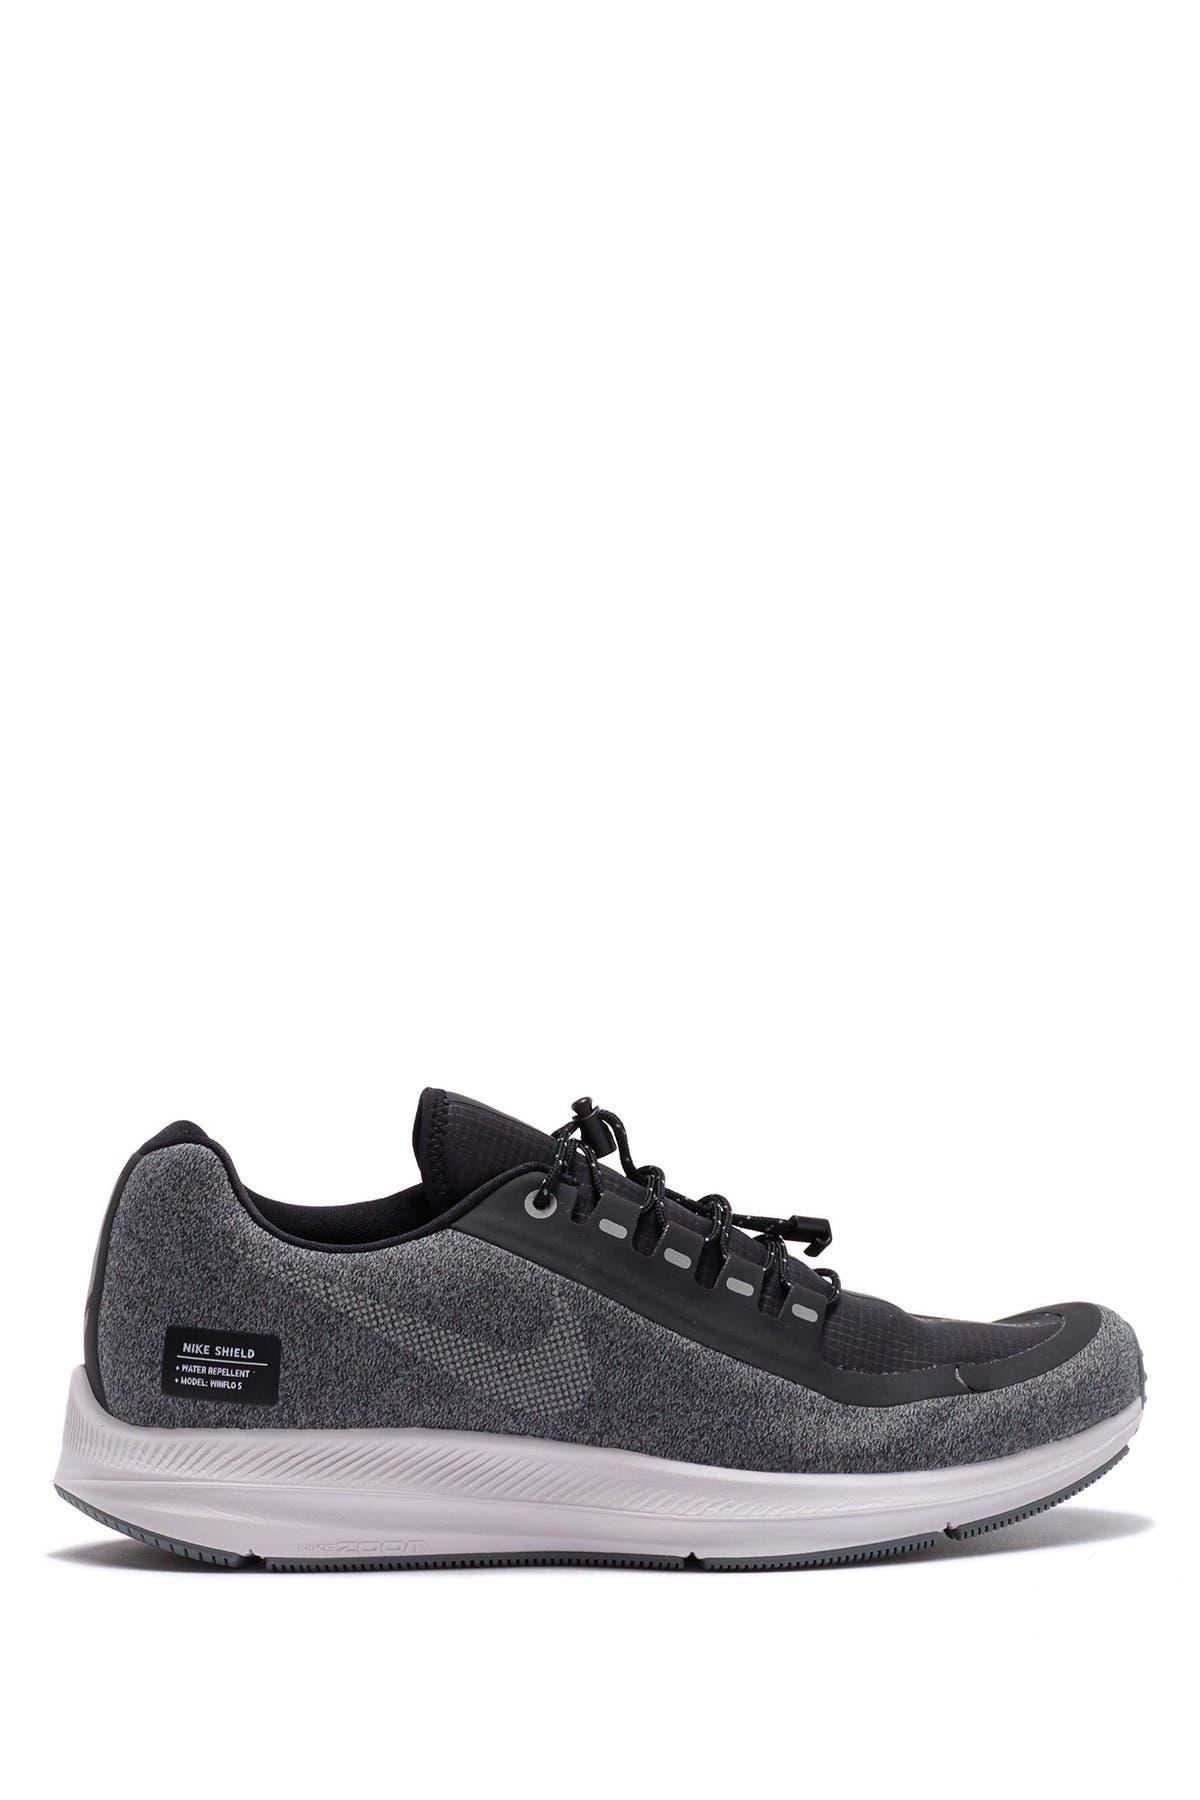 nike zoom winflo 5 shield ladies running shoes